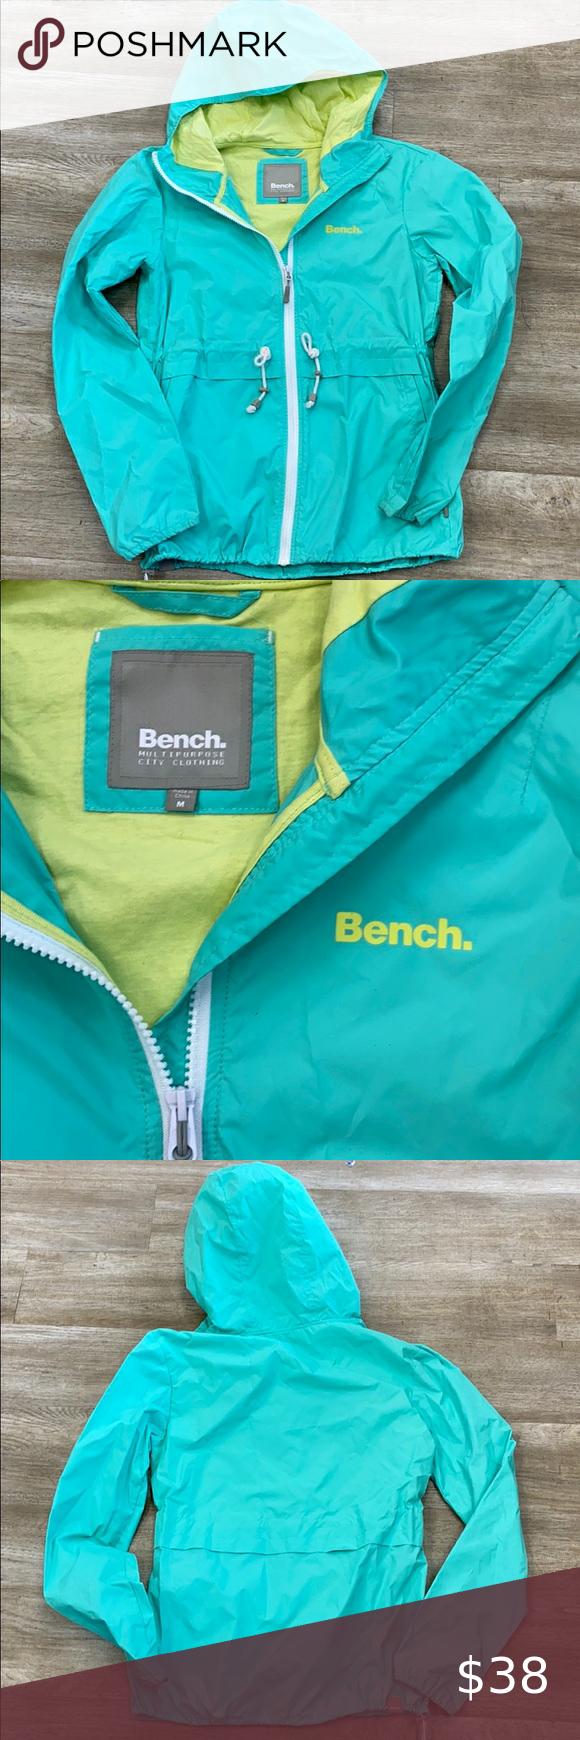 Bench Rain Coat In 2020 Bench Jackets Raincoat Jackets For Women